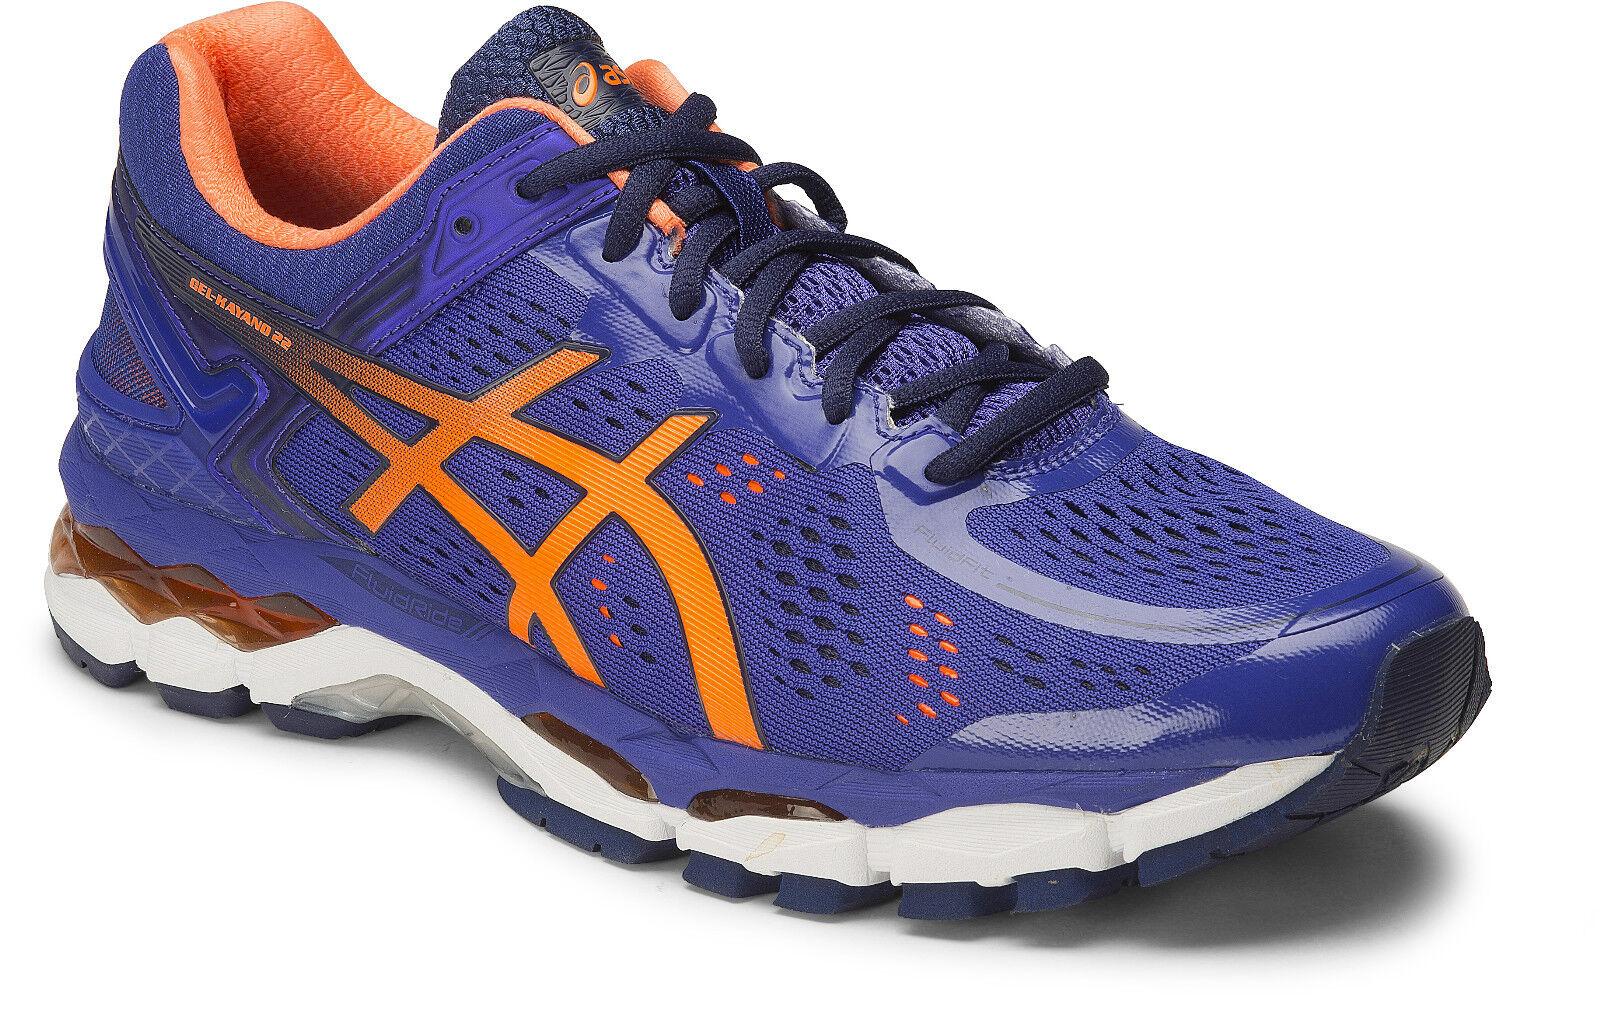 Asic gel kayano 22 (d) uomini scarpe da corsa (d) 22 (4330)salvare 964edb